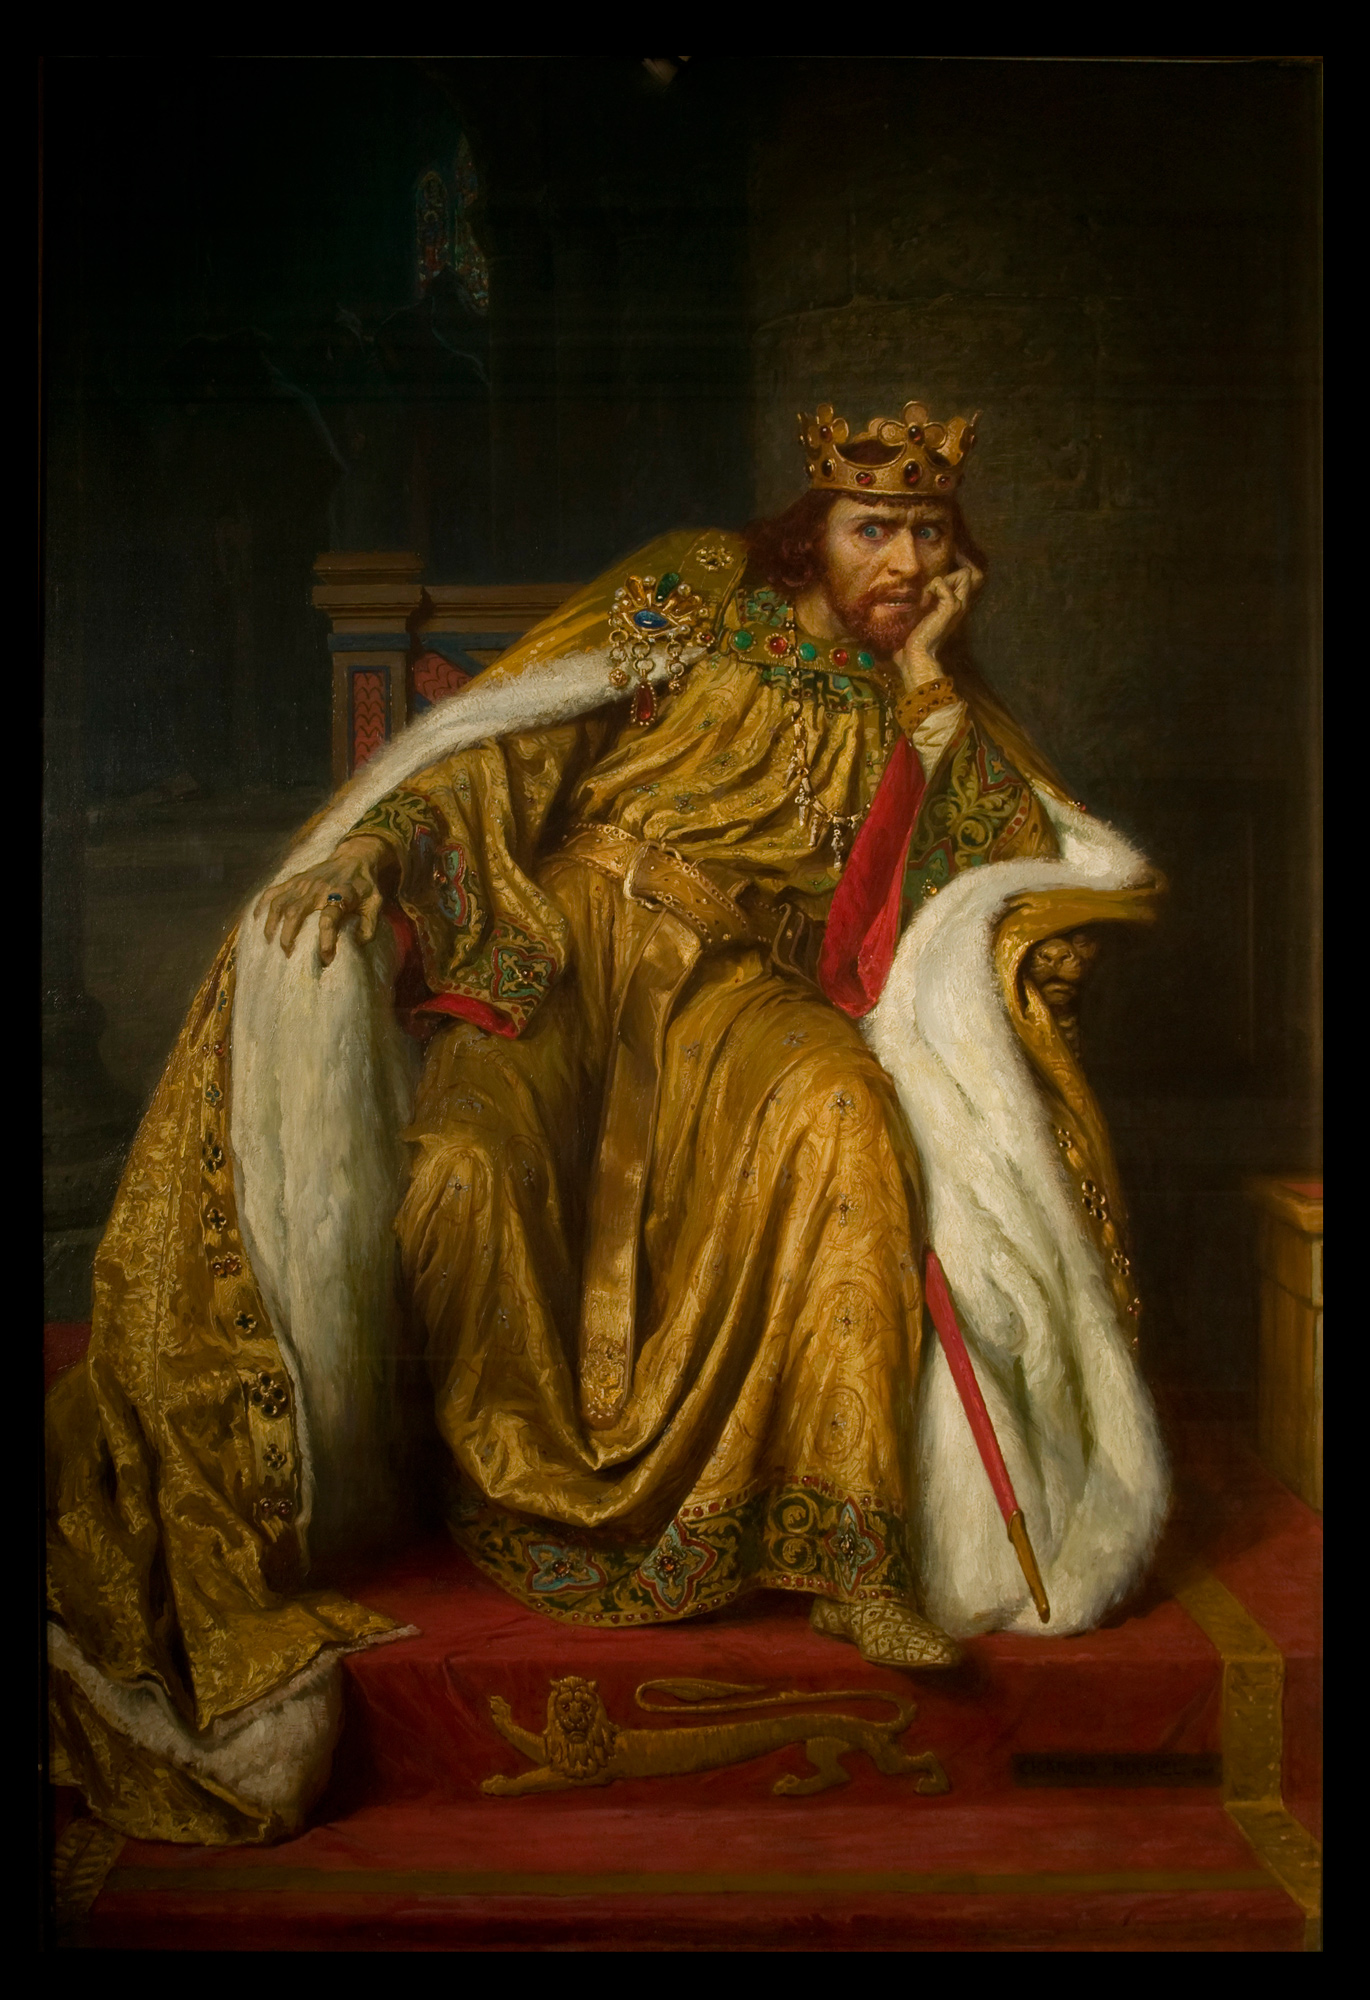 John, King of England's Throne